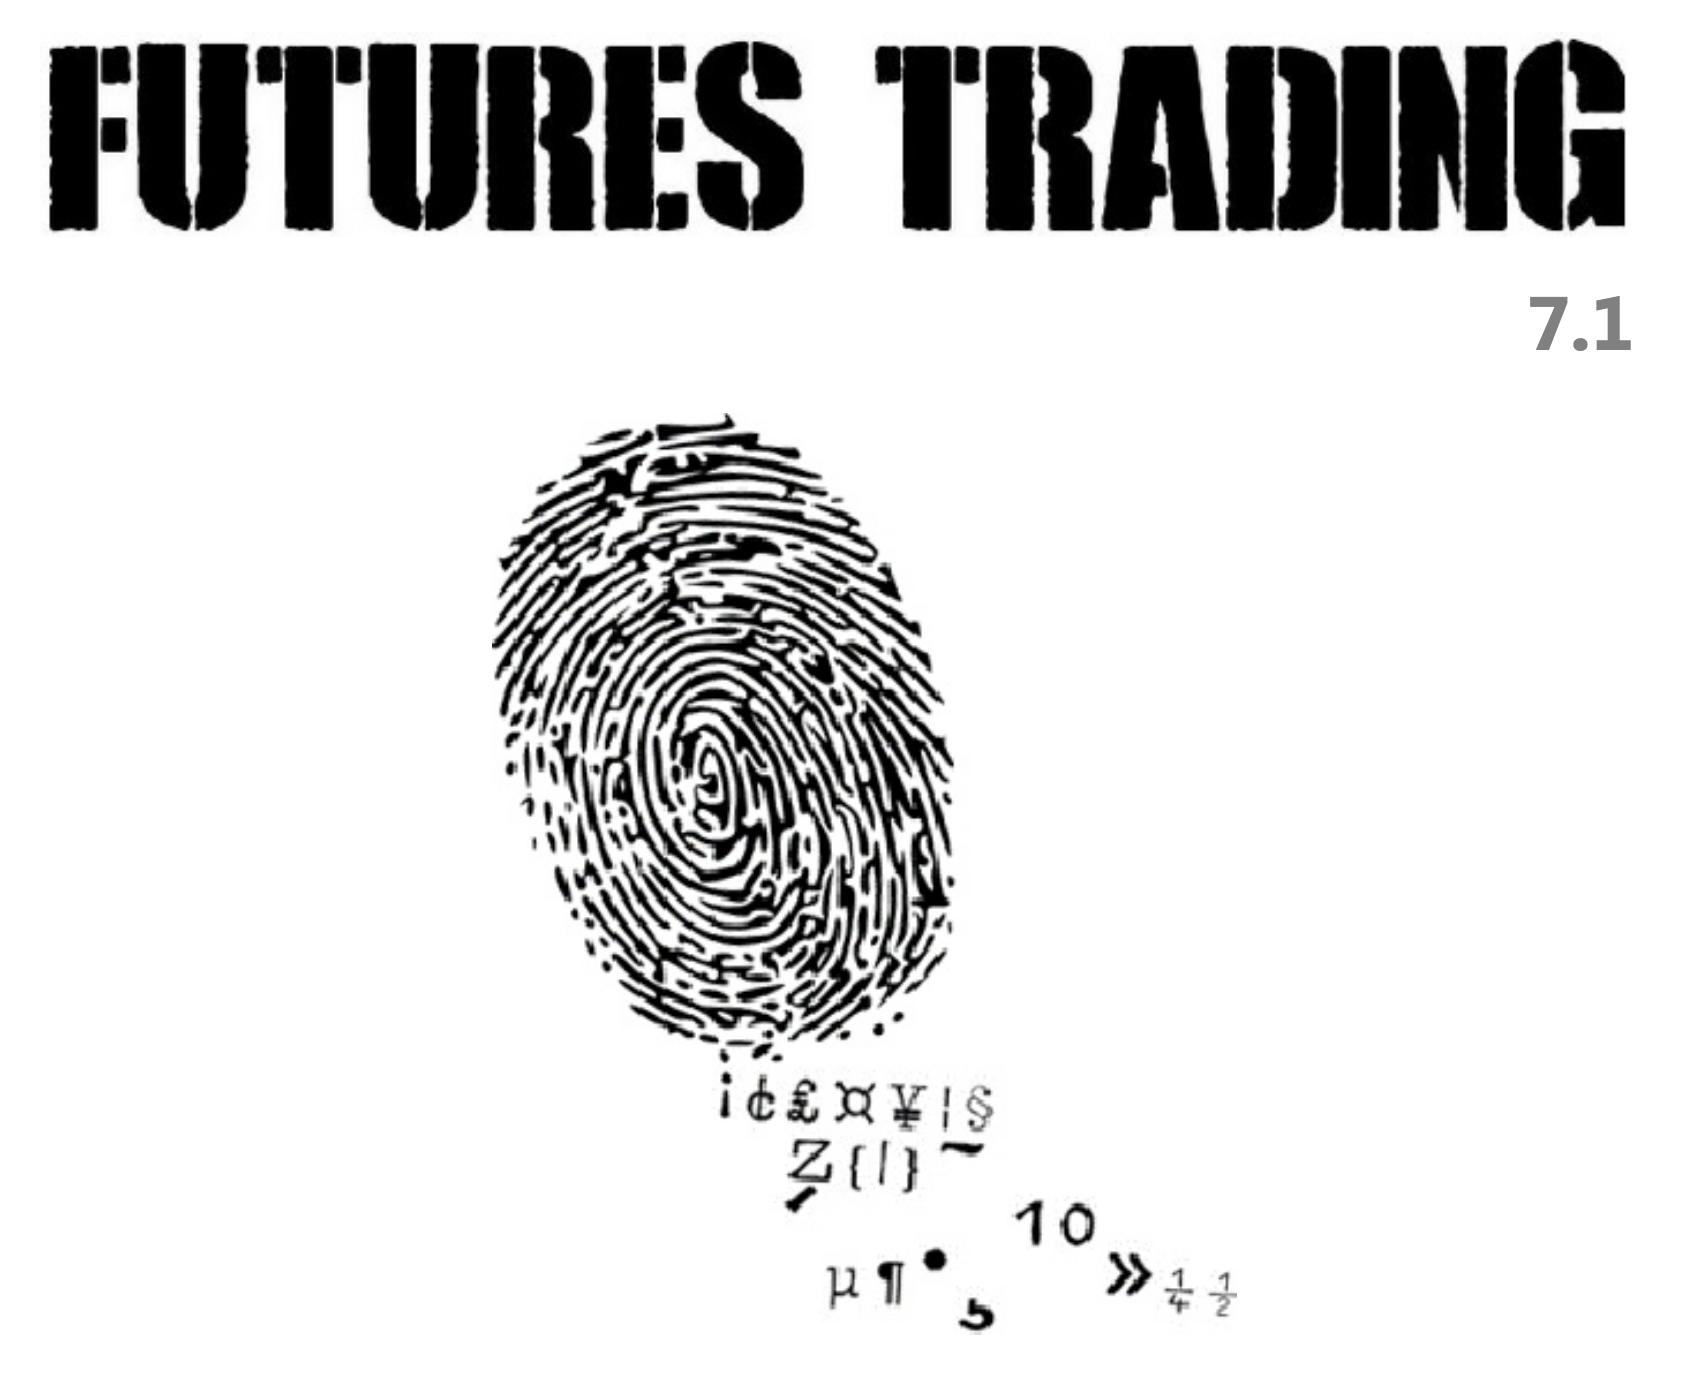 Futures-trading 7.1